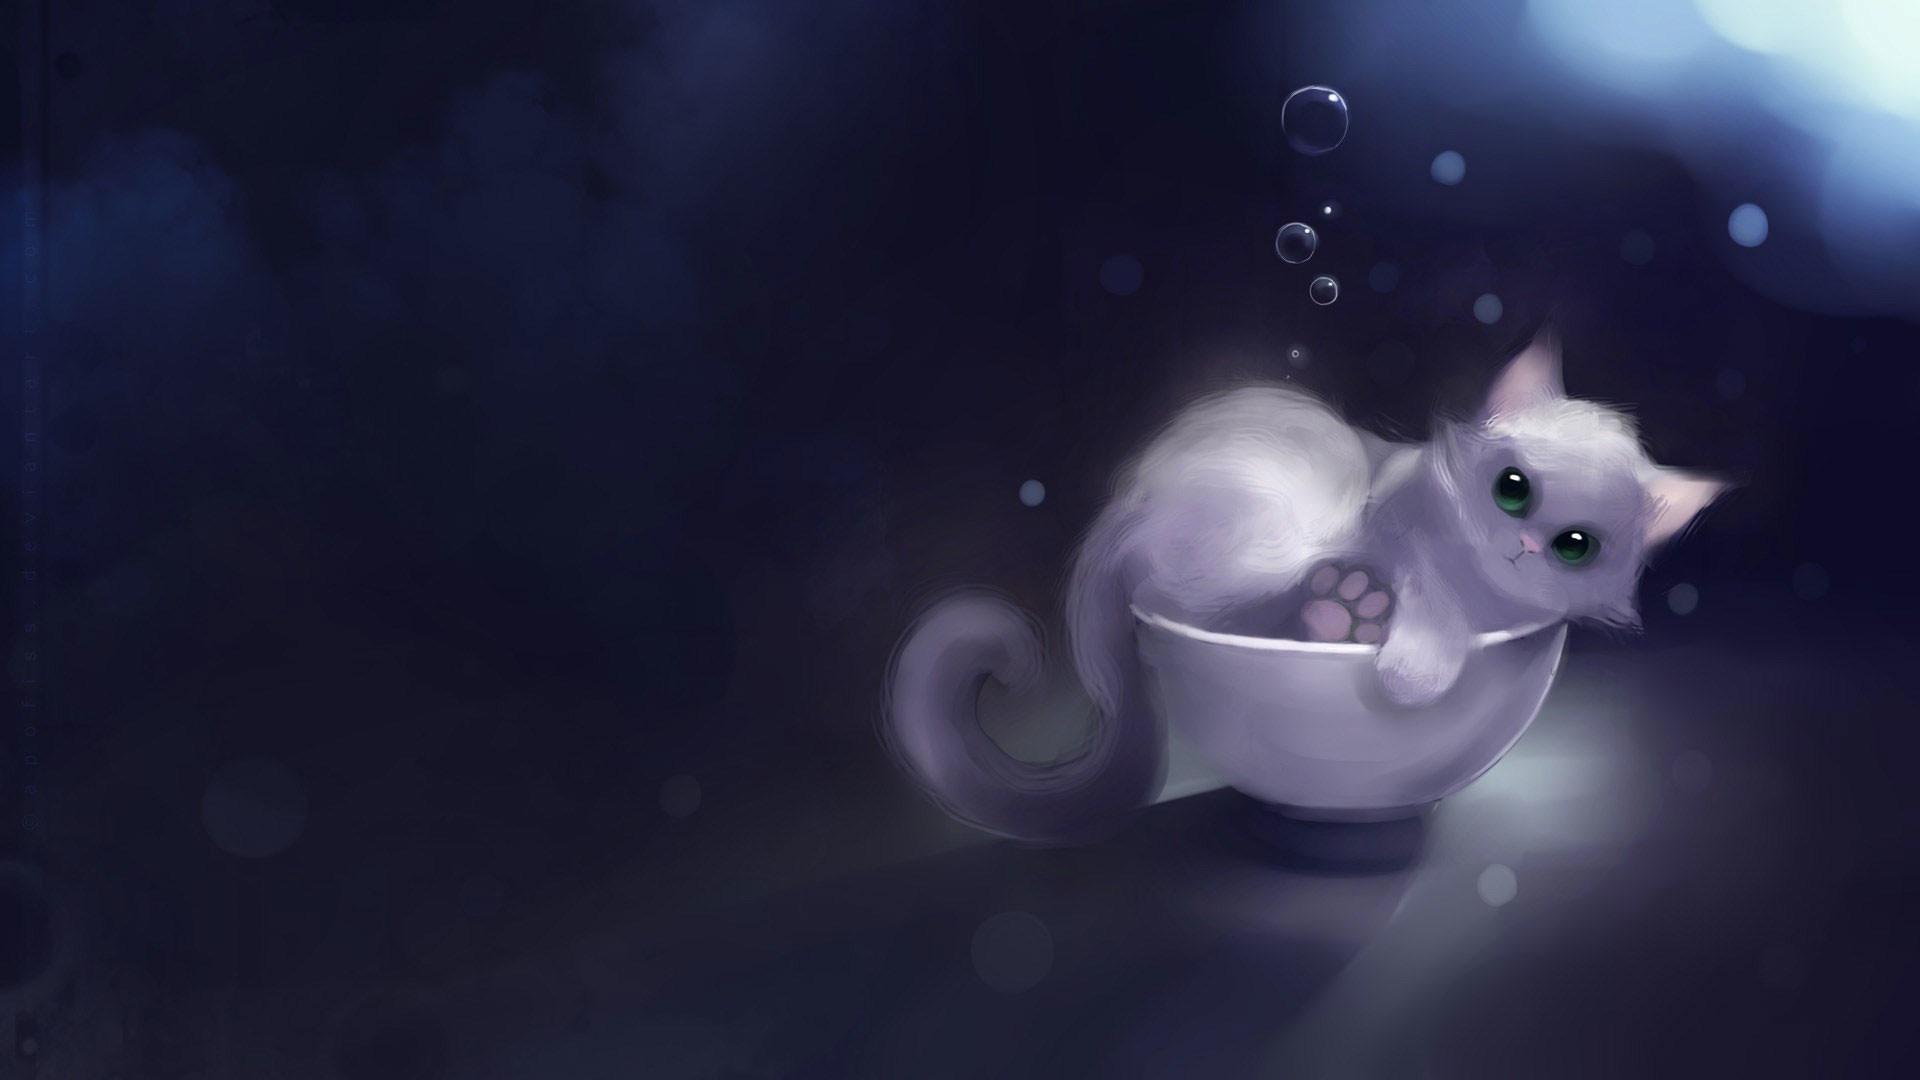 hd pics photos beautiful 2d animated cartoon cat hd quality desktop  background wallpaper